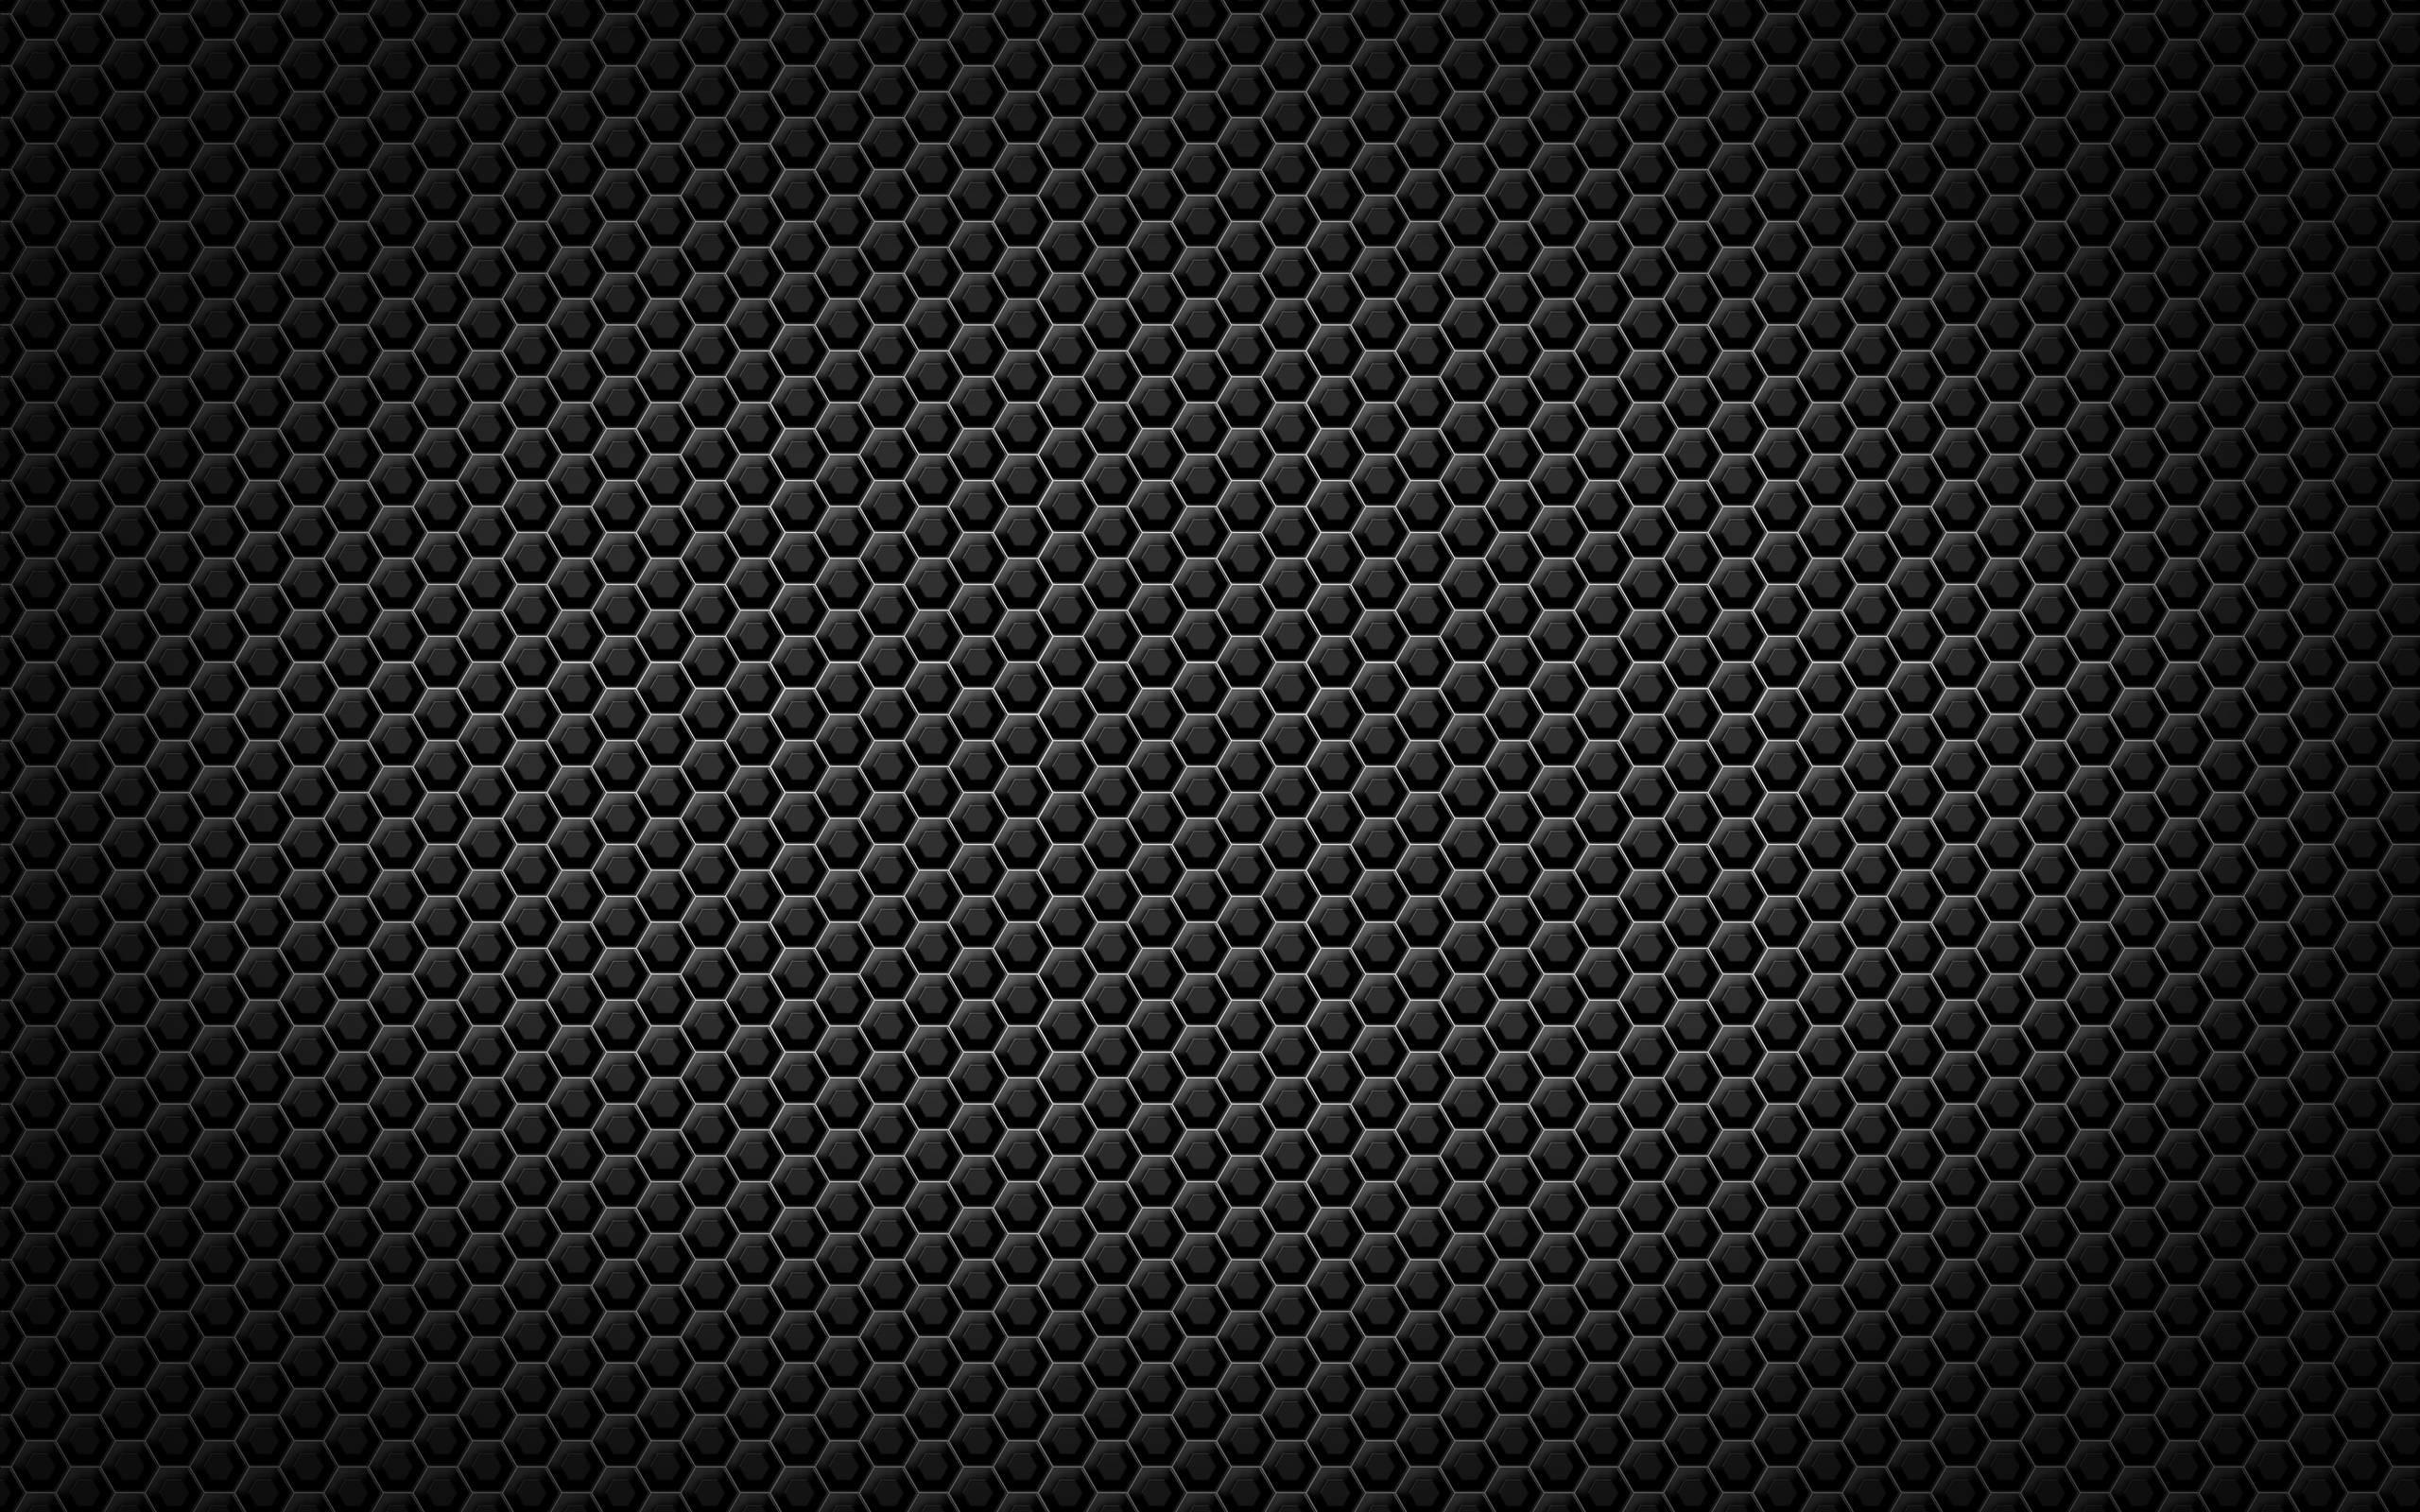 Hexagon Wallpapers – Full HD wallpaper search